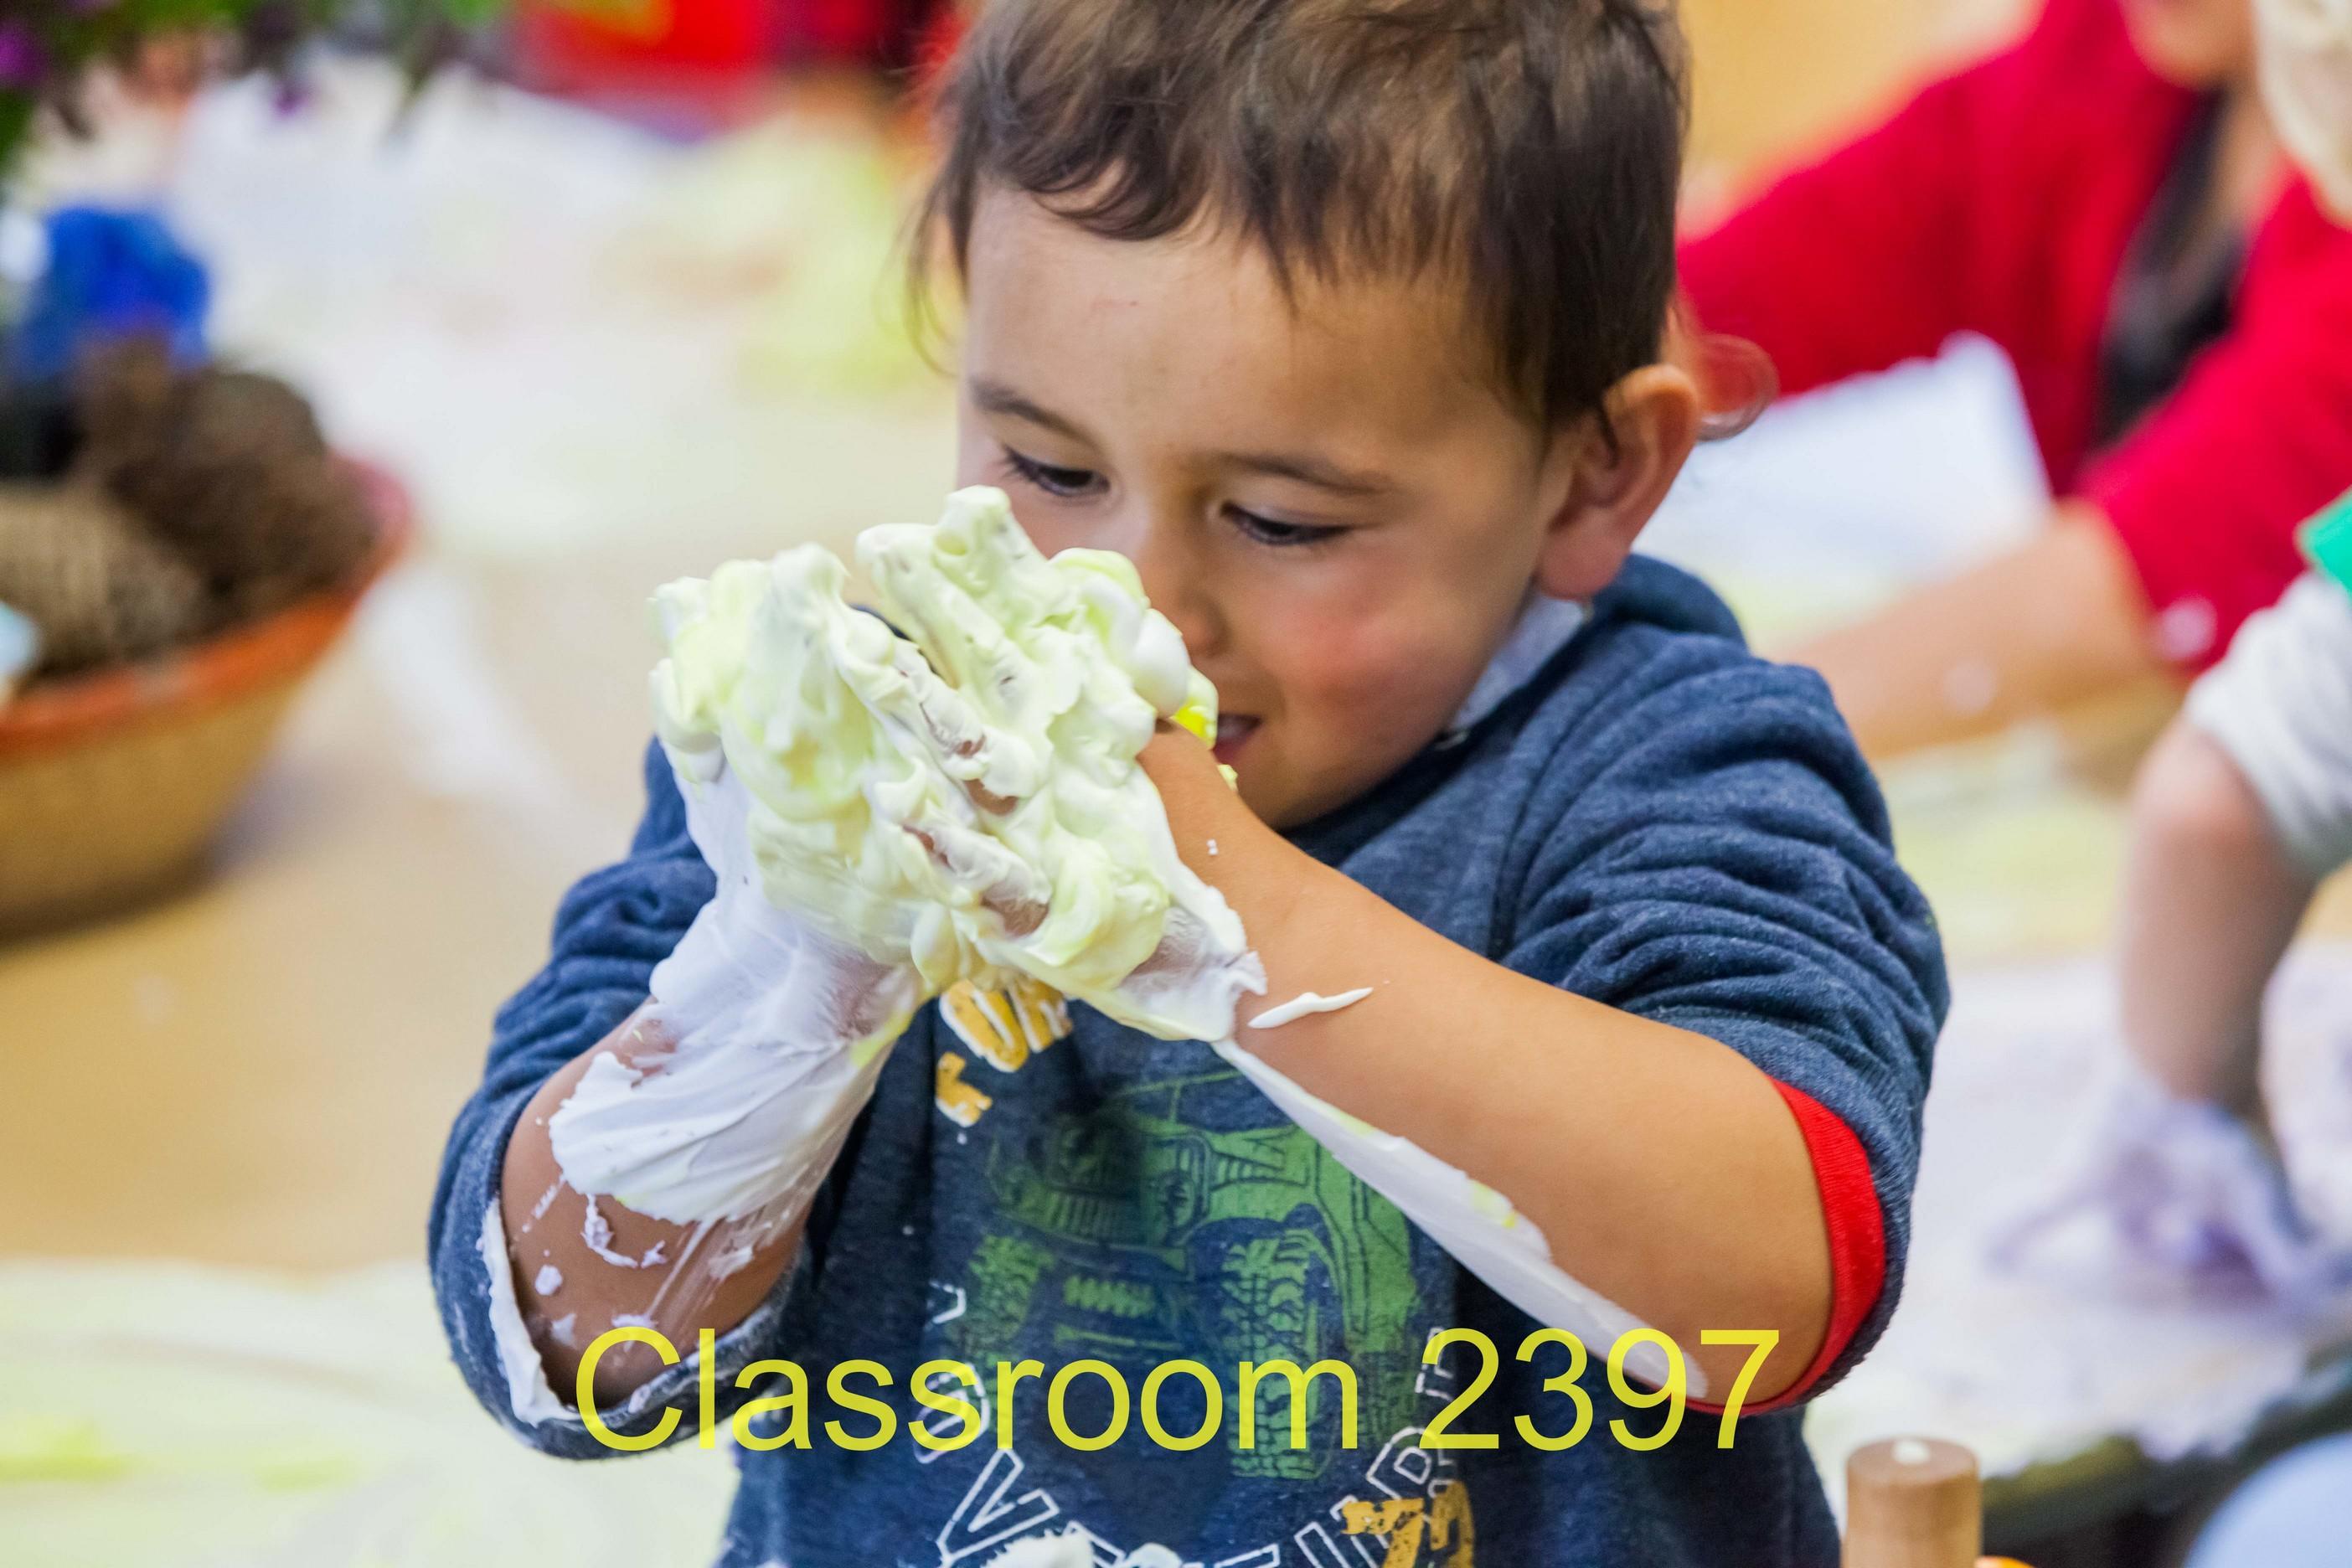 Classroom 2397